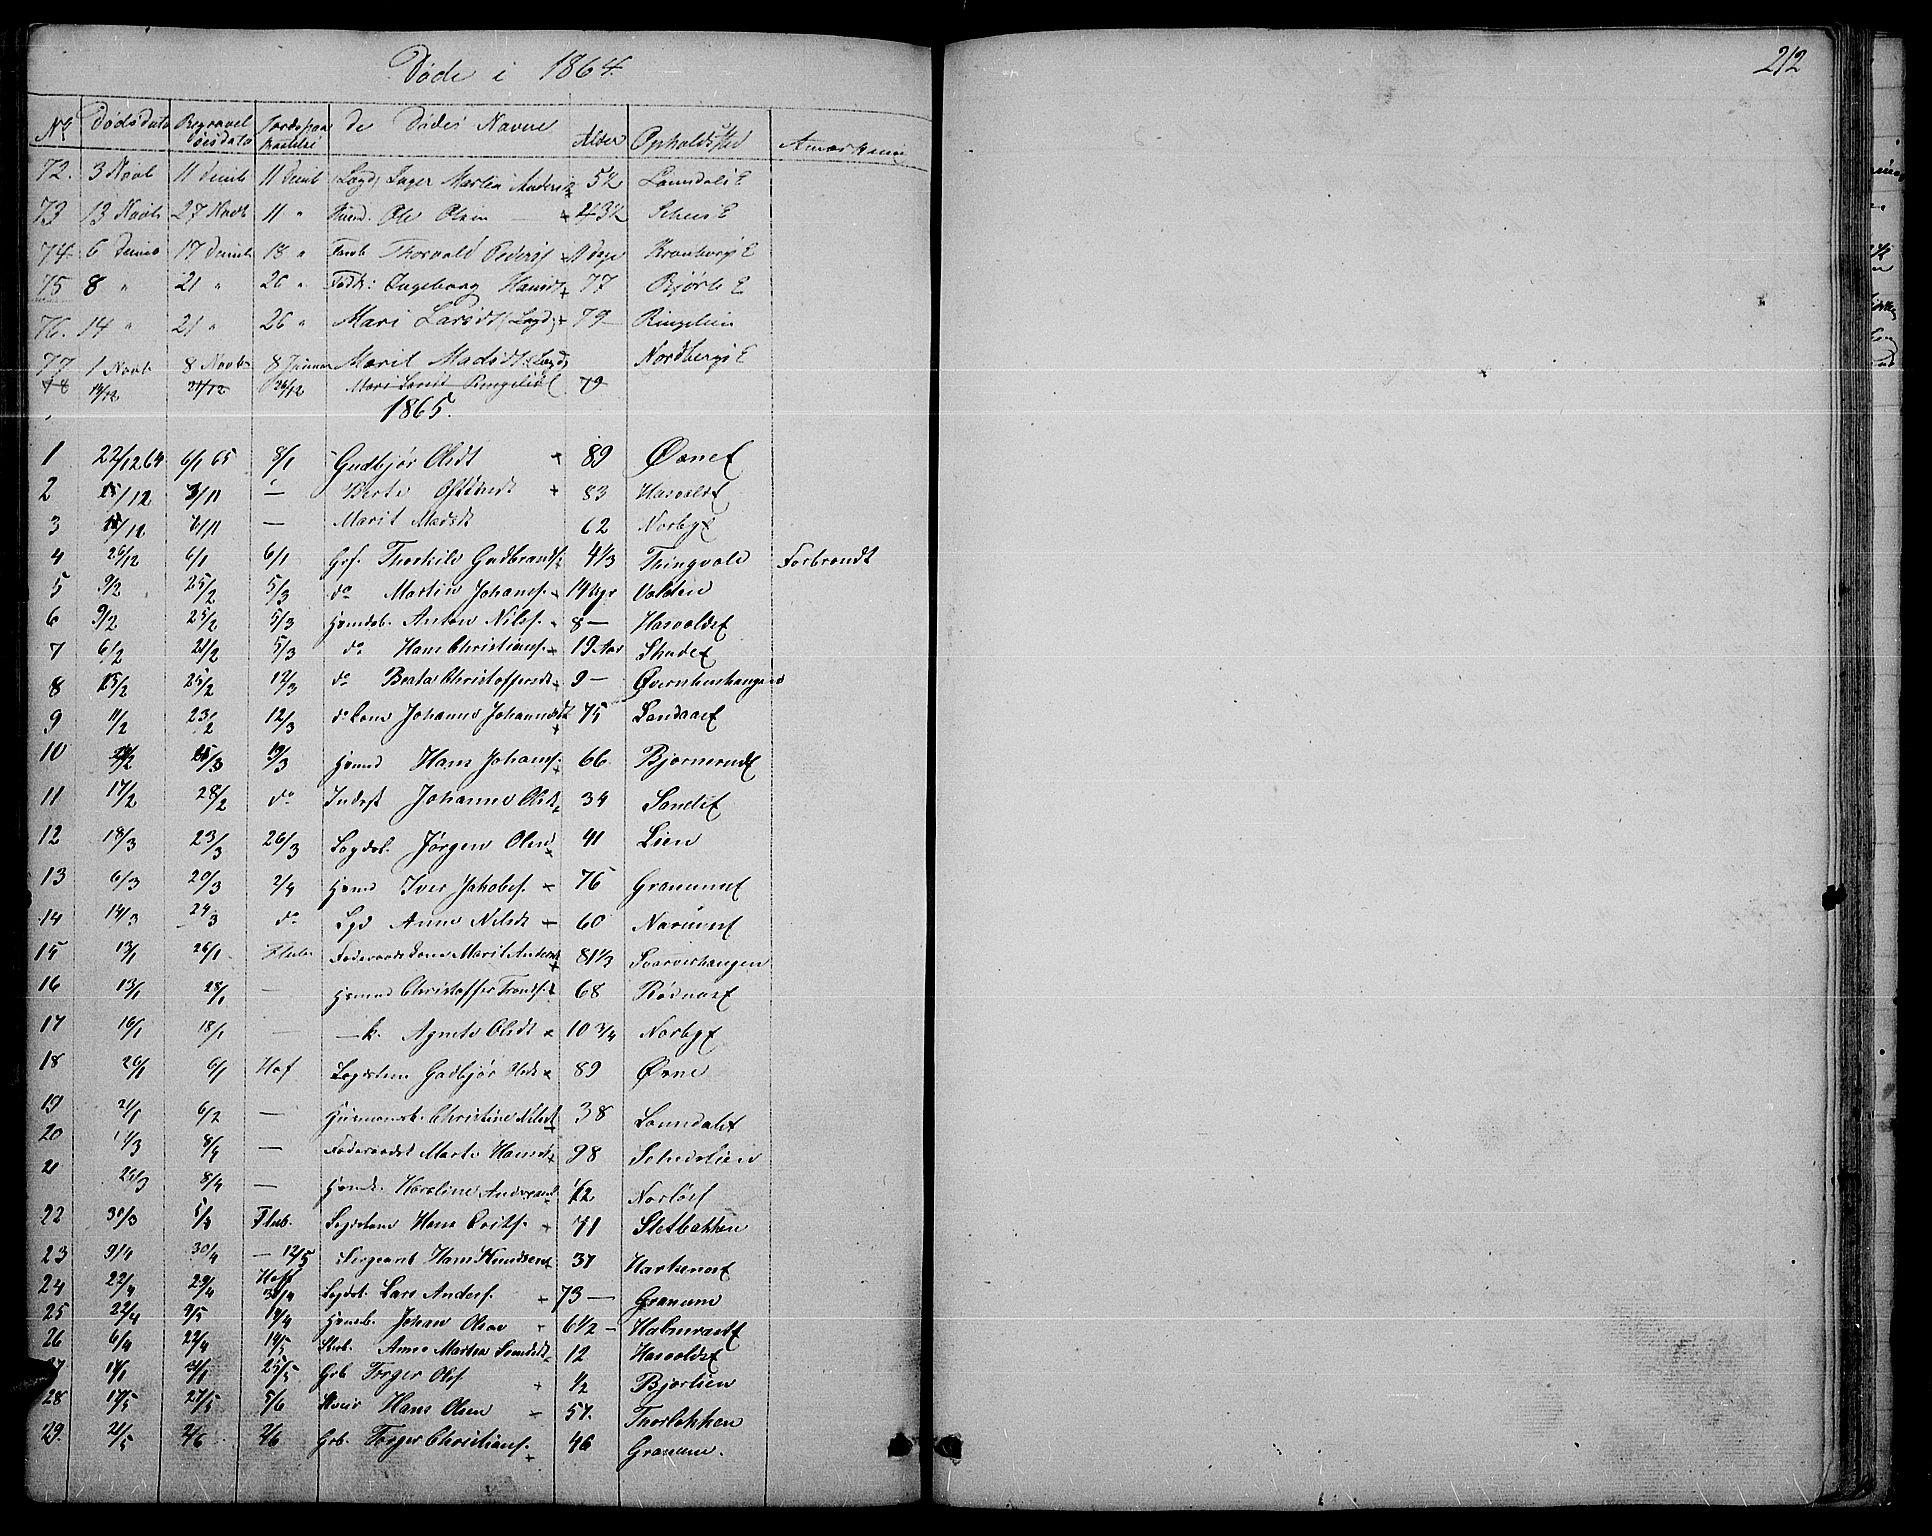 SAH, Søndre Land prestekontor, L/L0001: Klokkerbok nr. 1, 1849-1883, s. 212